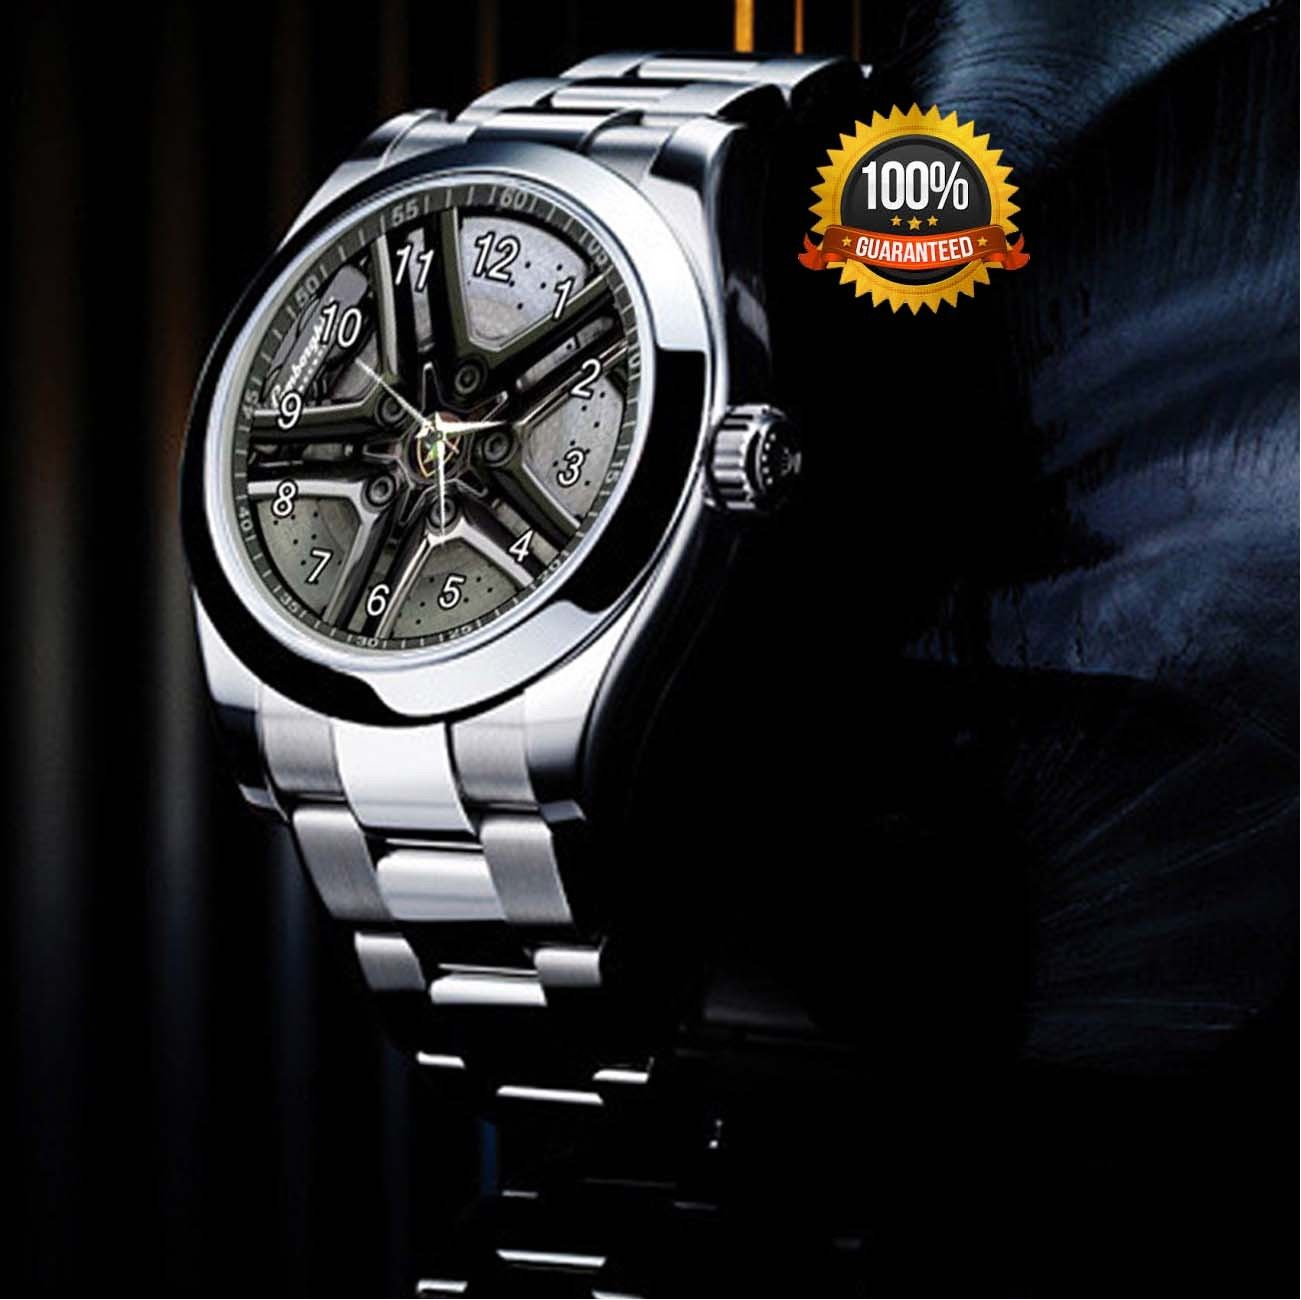 Amazing Watches 2012 Lamborghini Aventador LP700-4 with New V12 Engine rim  wheels 2017 2018